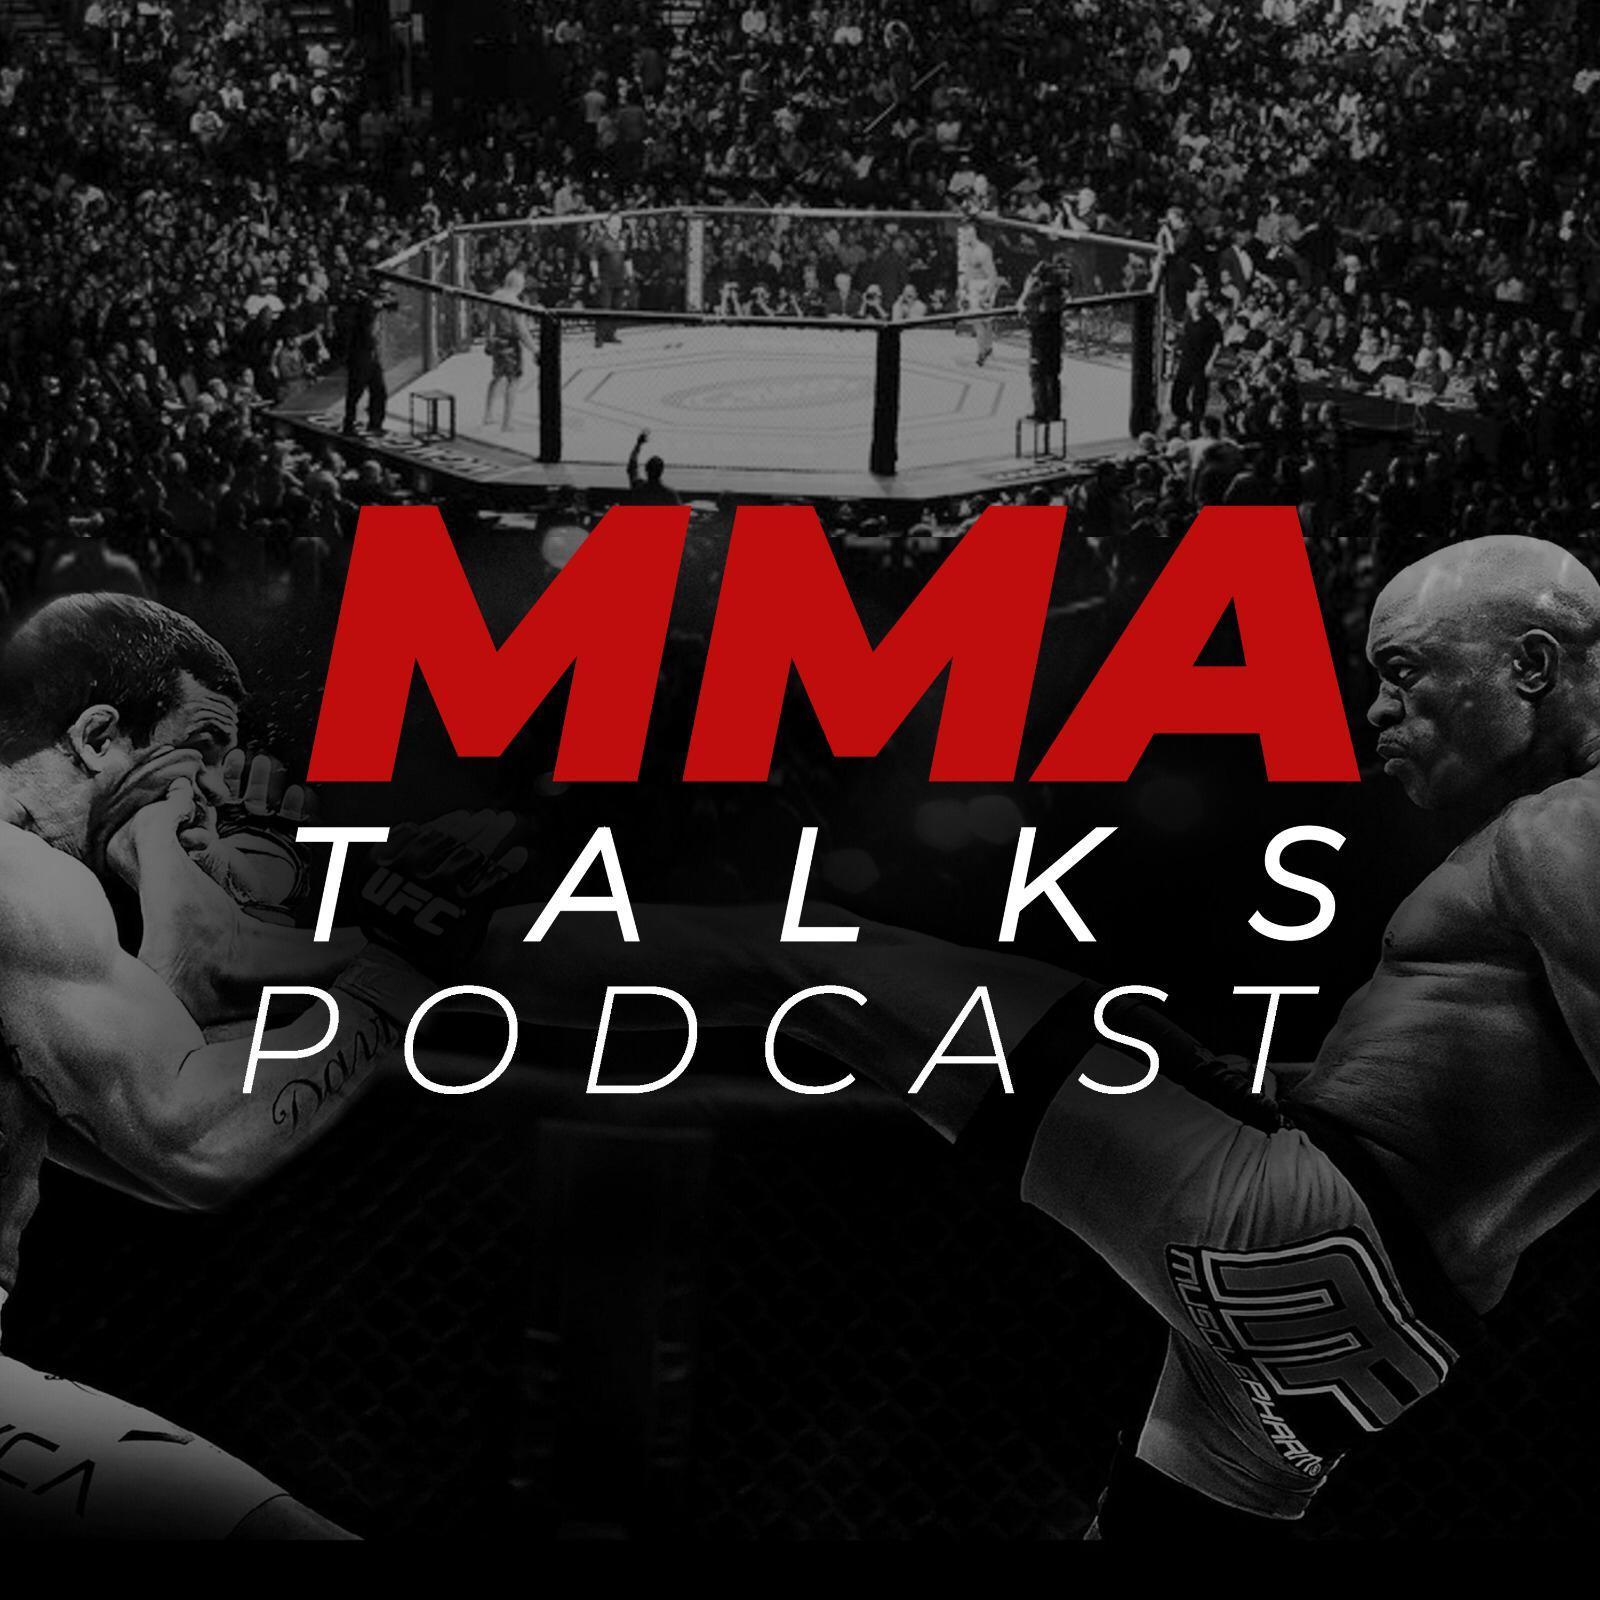 MMA Talks Podcast #66 - Anteprima Vettori vs. Holland